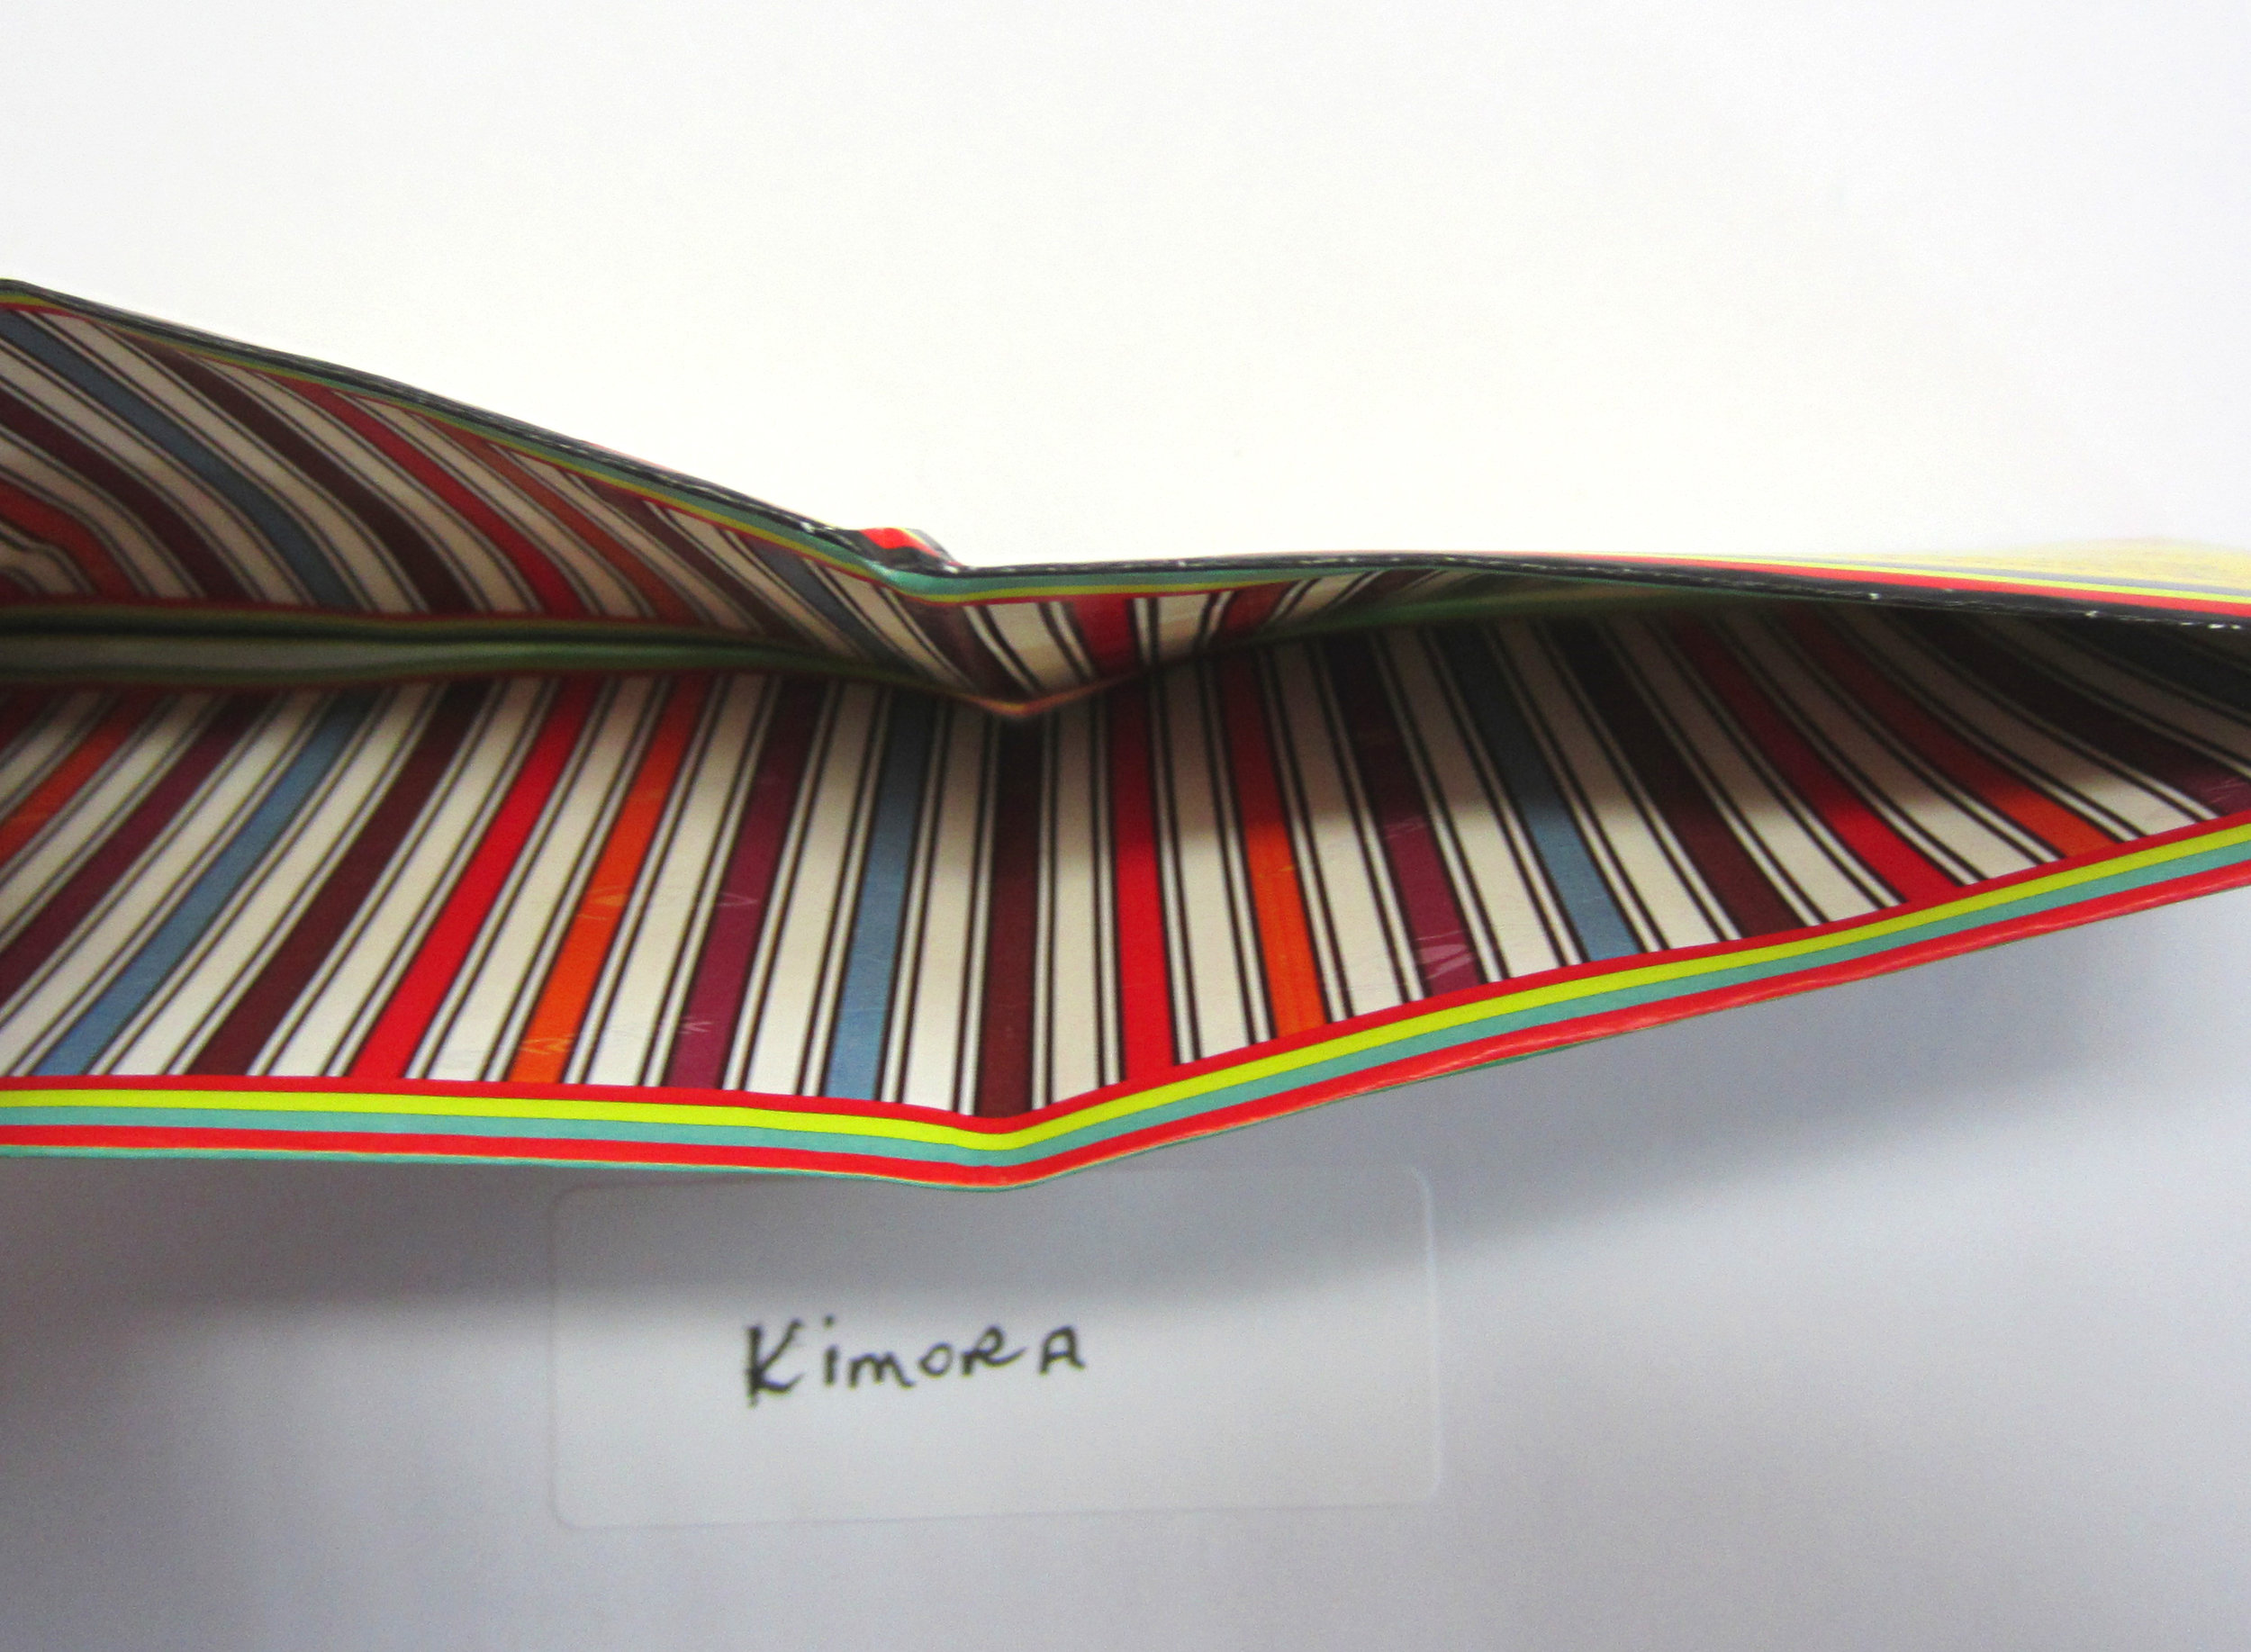 Kimora-inside.jpg